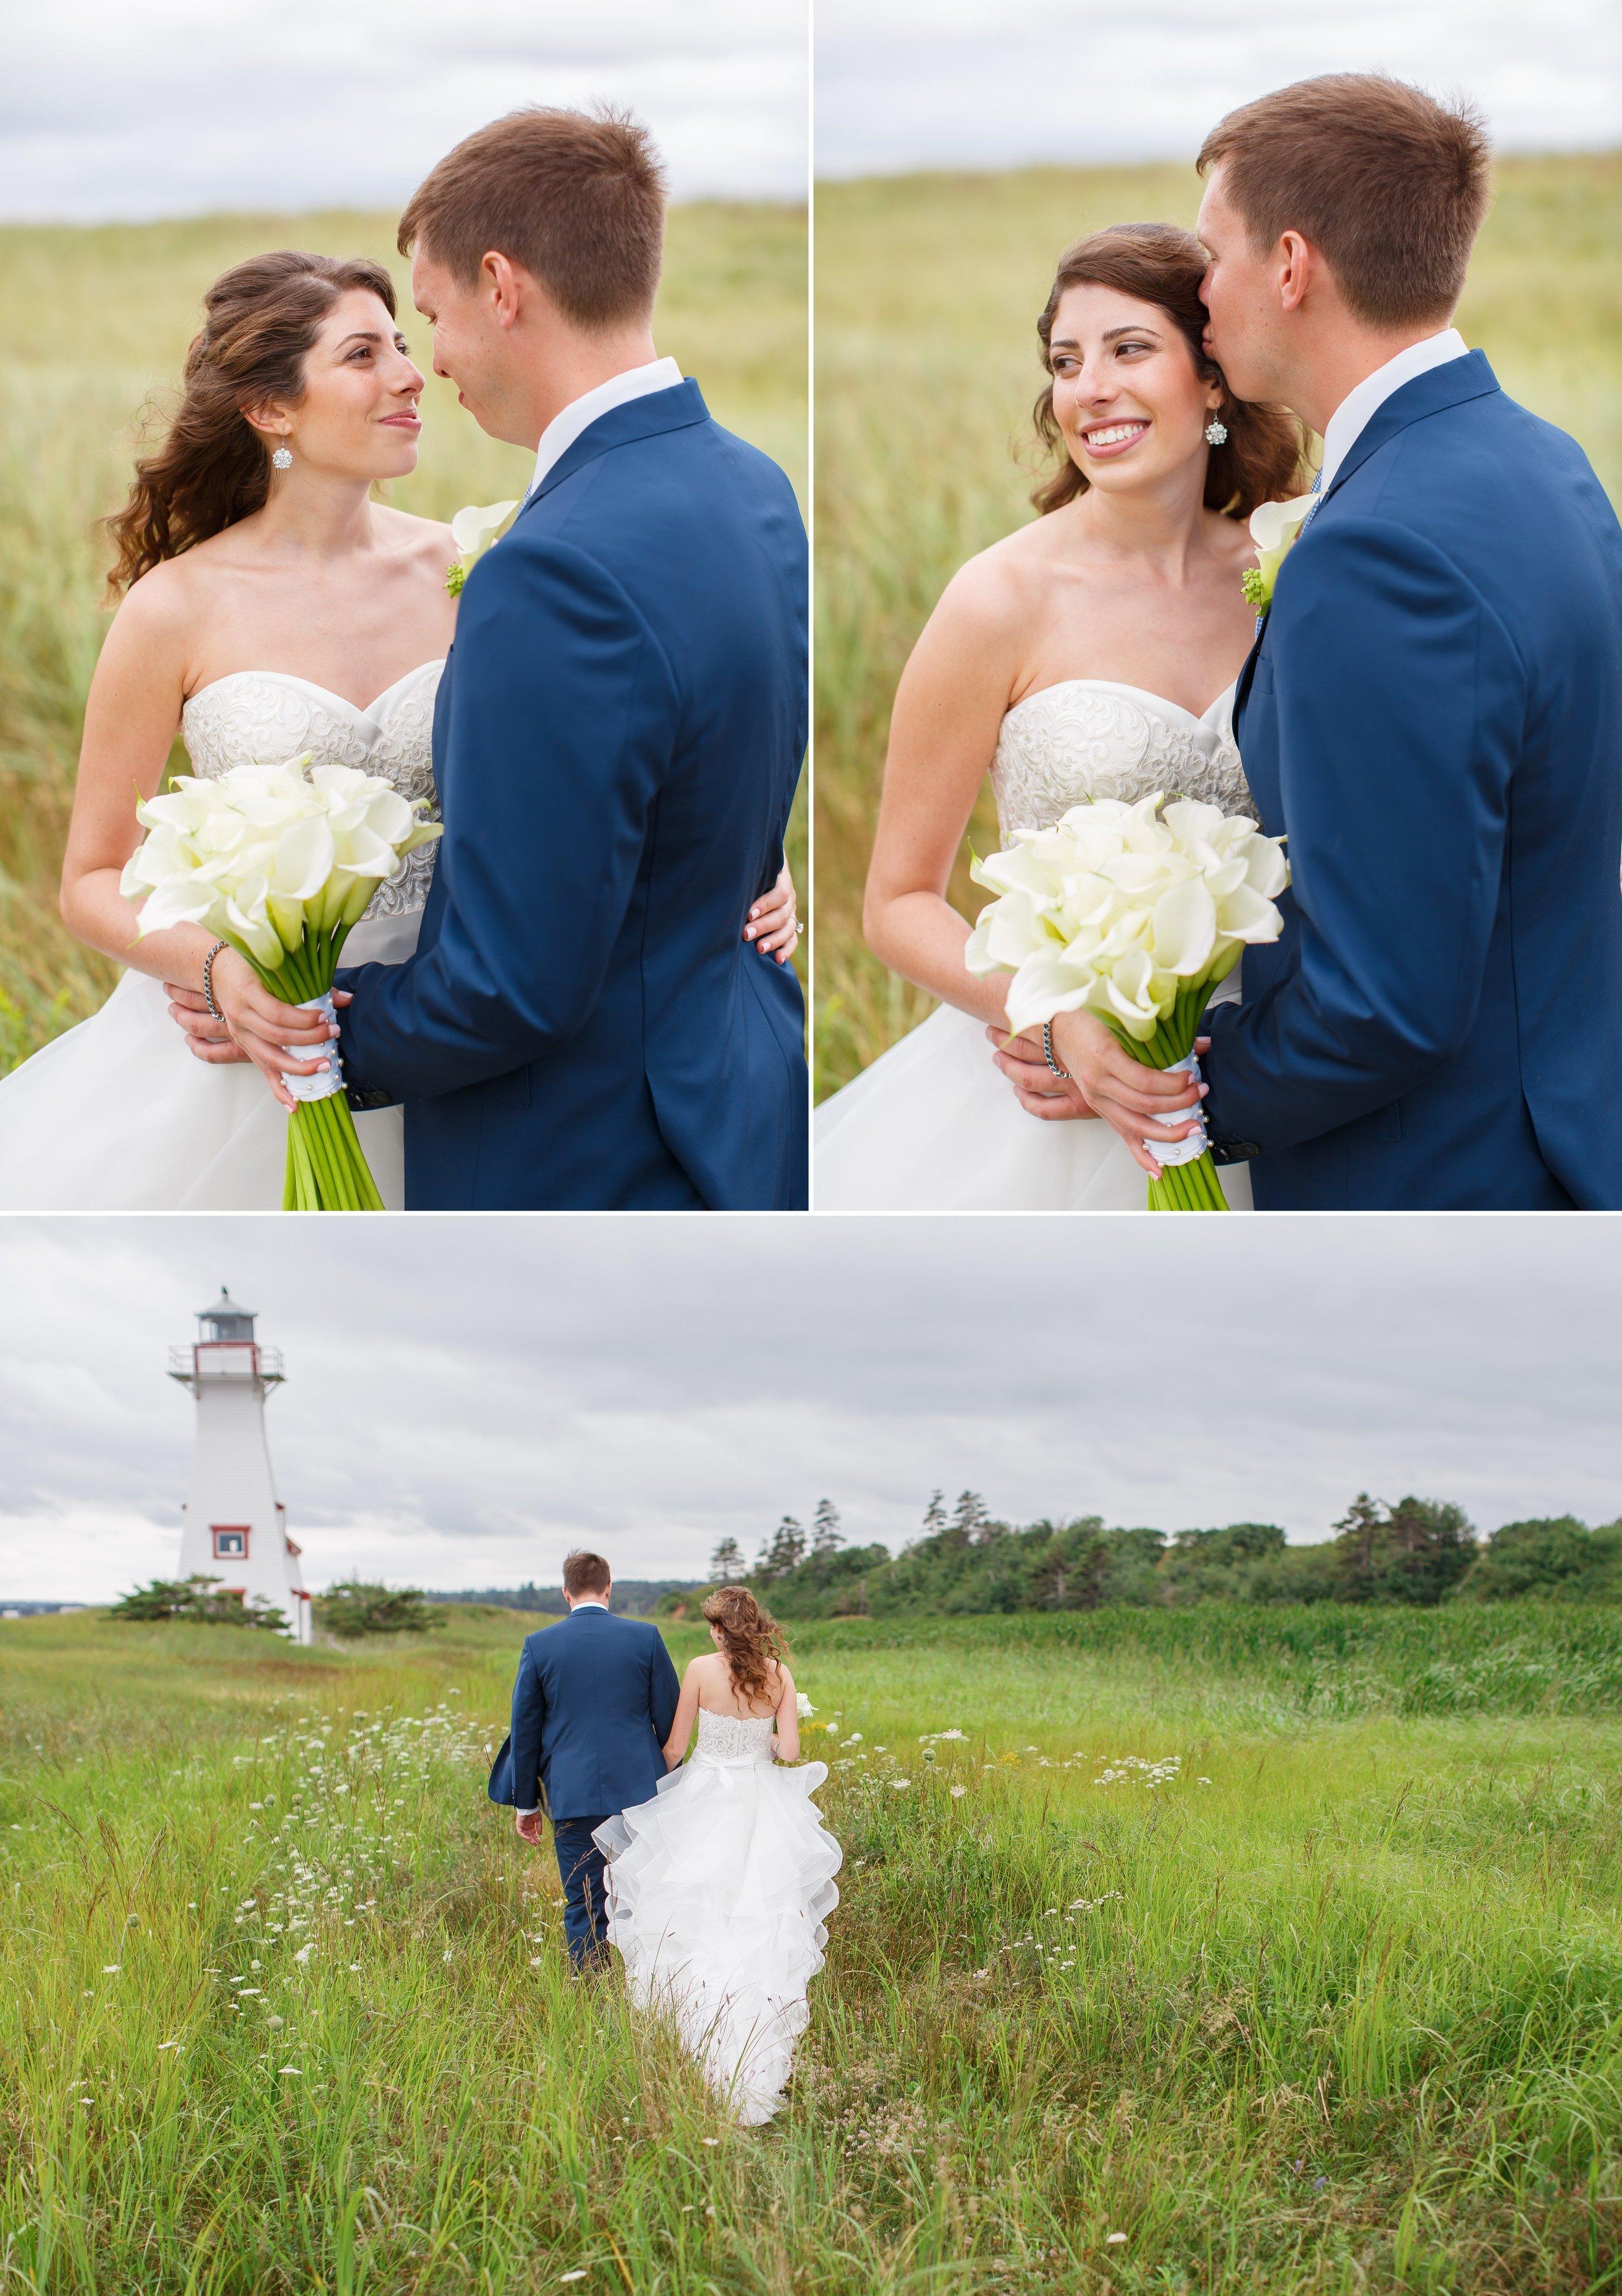 dfc757790c pei wedding at clinton hills — Blog — Brady McCloskey Photography